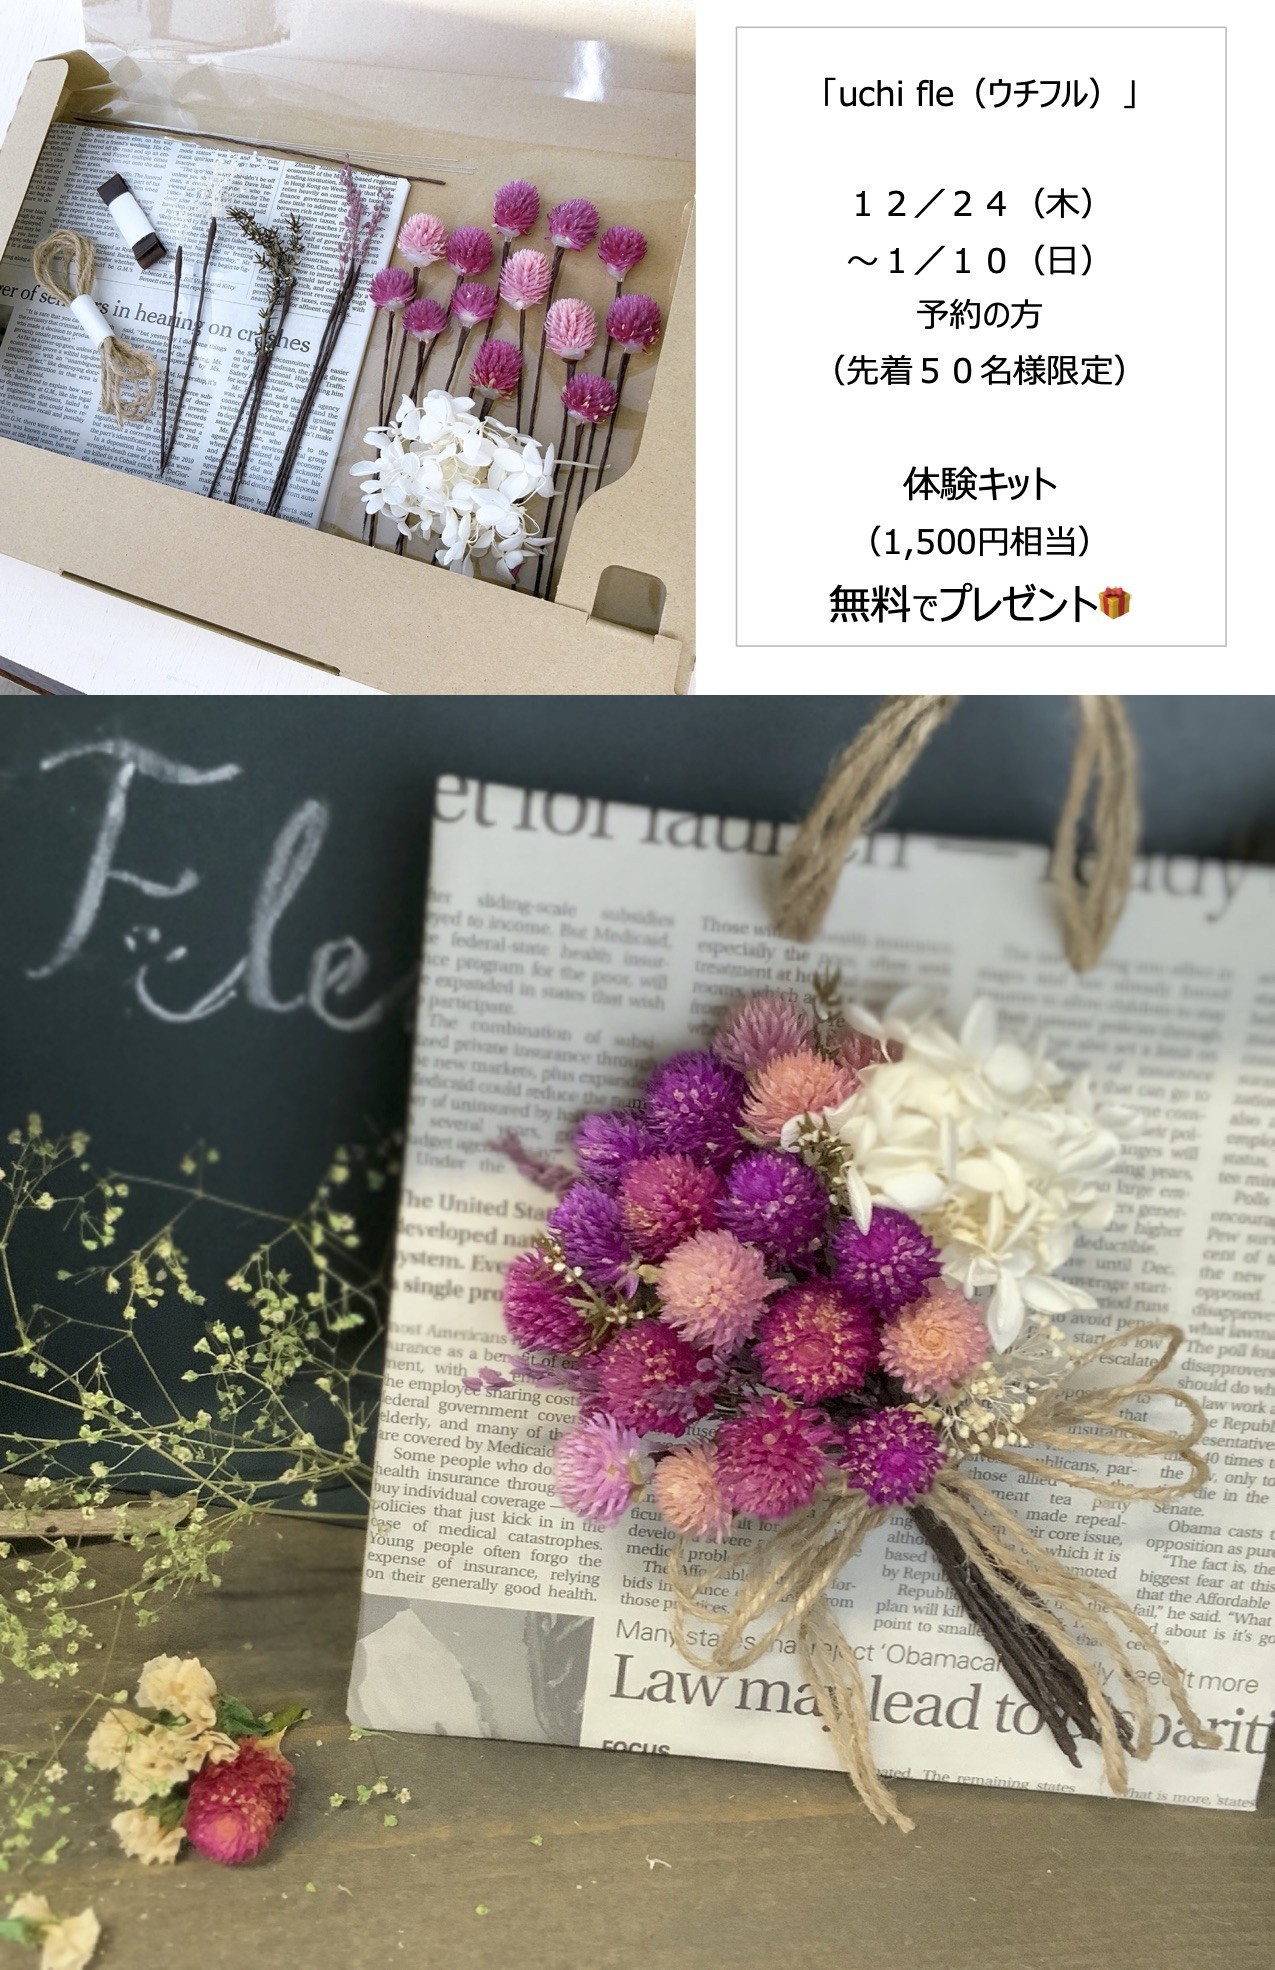 「uchi fle(ウチフル)」予約受付中!